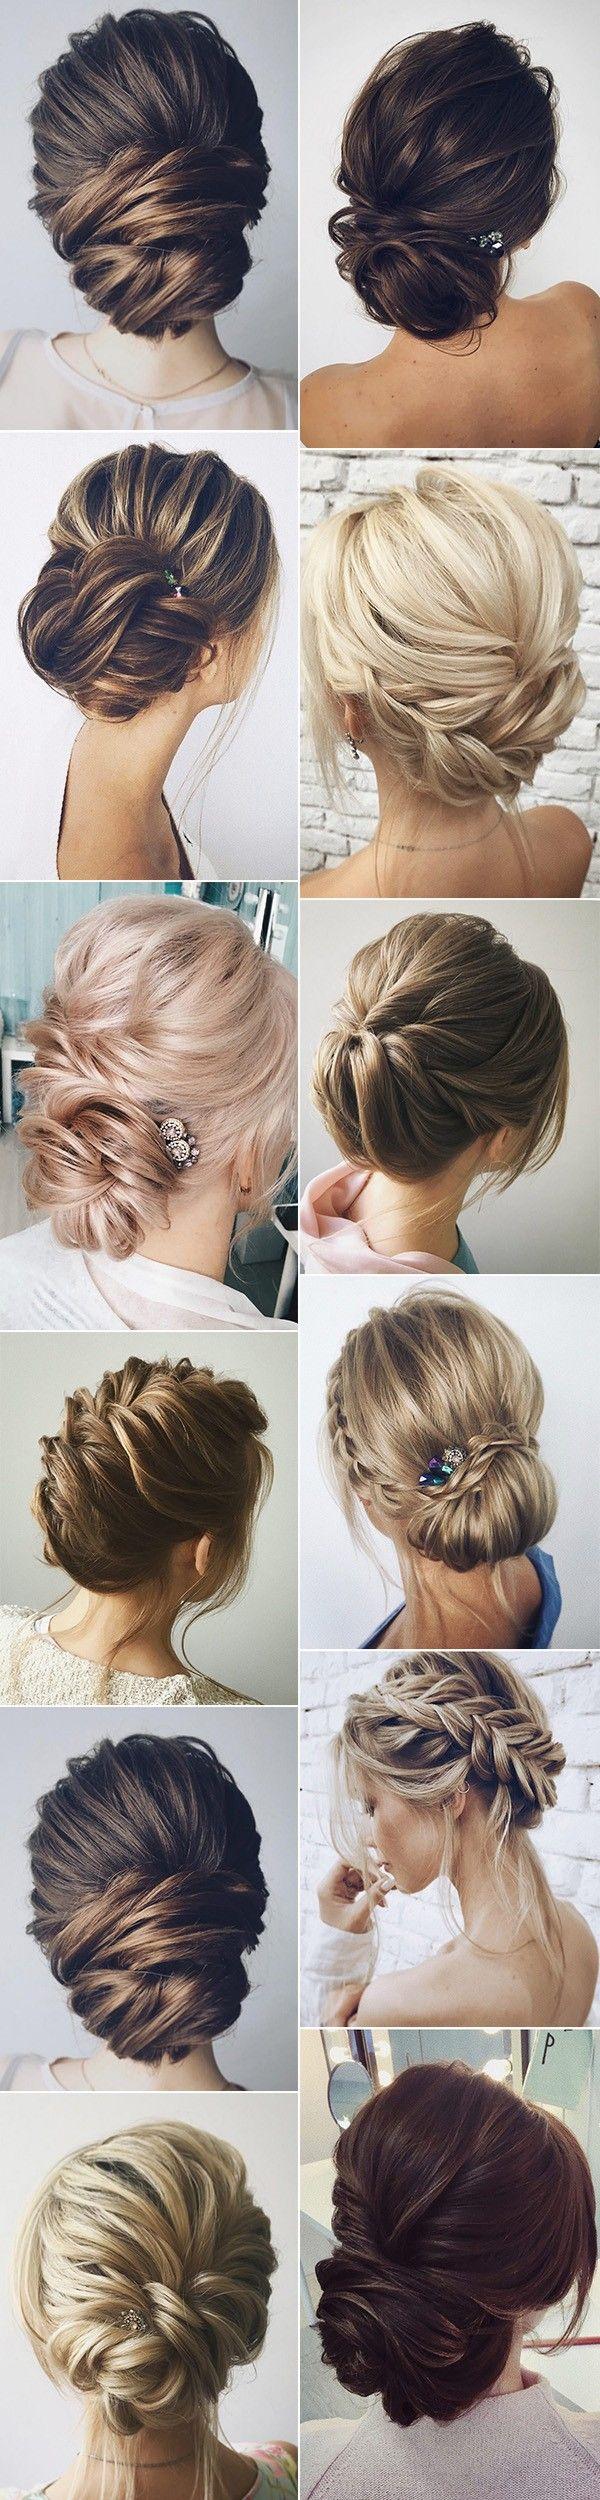 12 trending updo wedding hairstyles from instagram | elegant